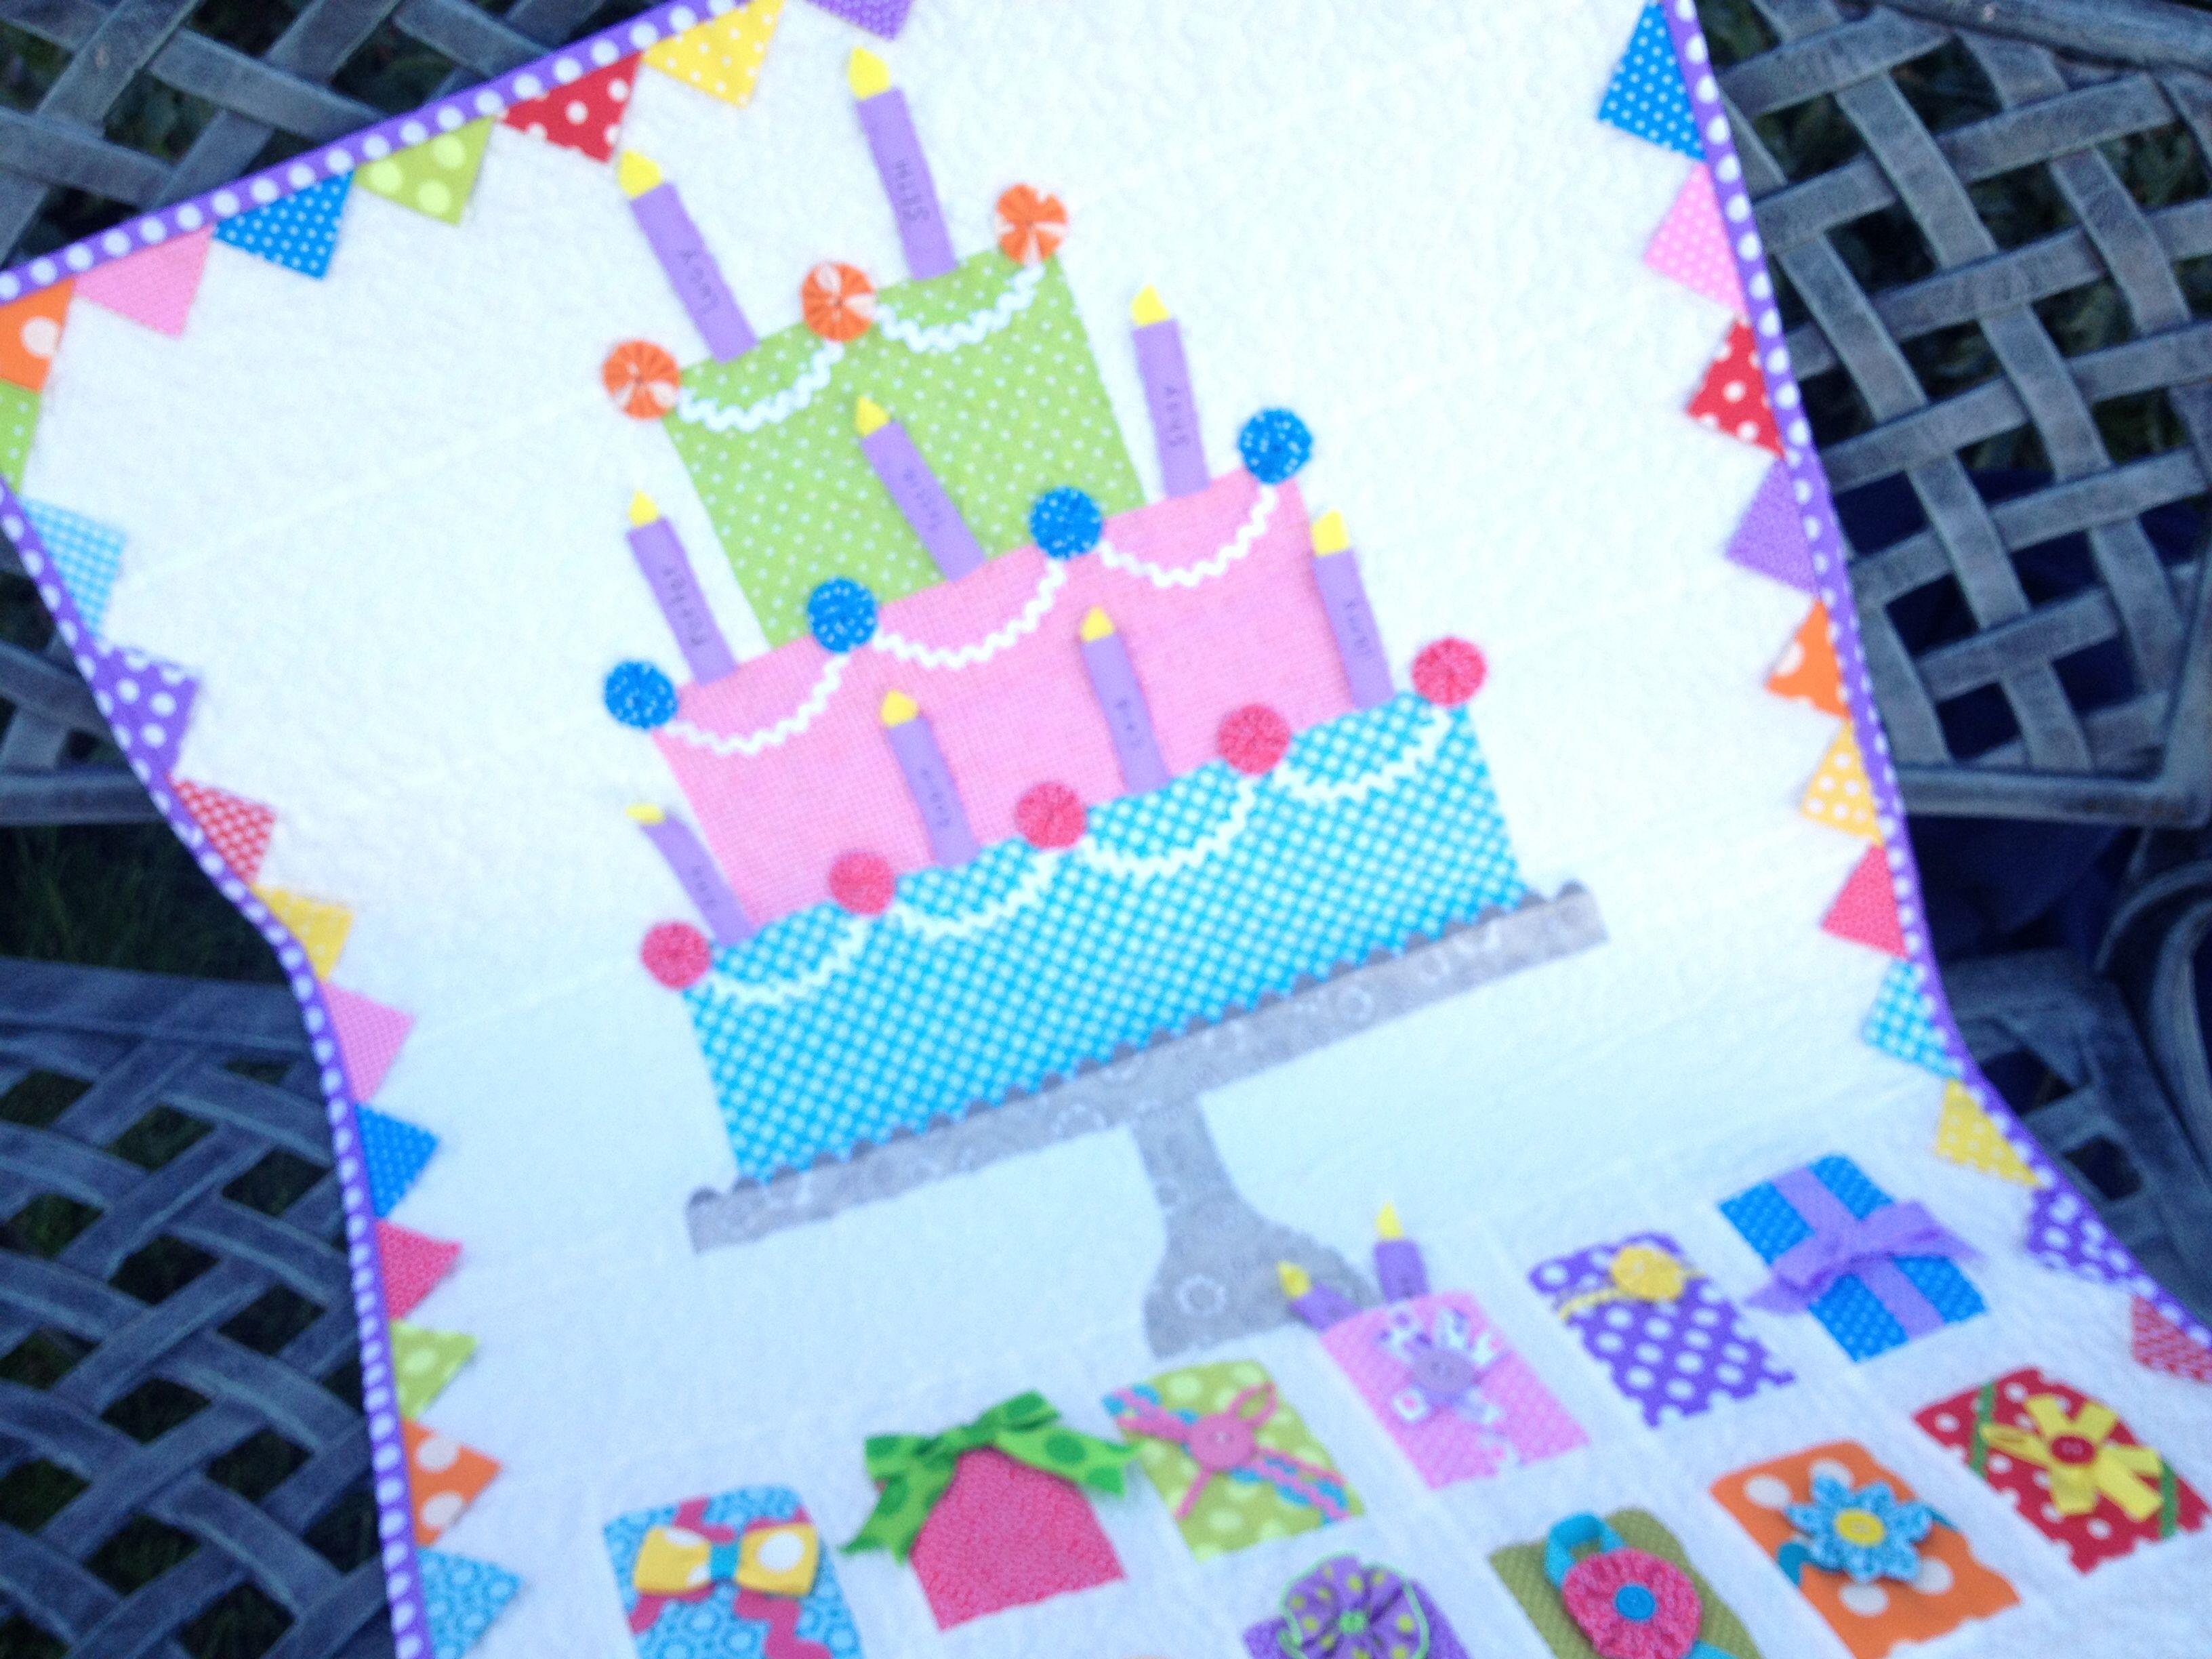 Happy birthday under the garden moon pinterest happy birthday birthday and scrappy quilts for Under the garden moon